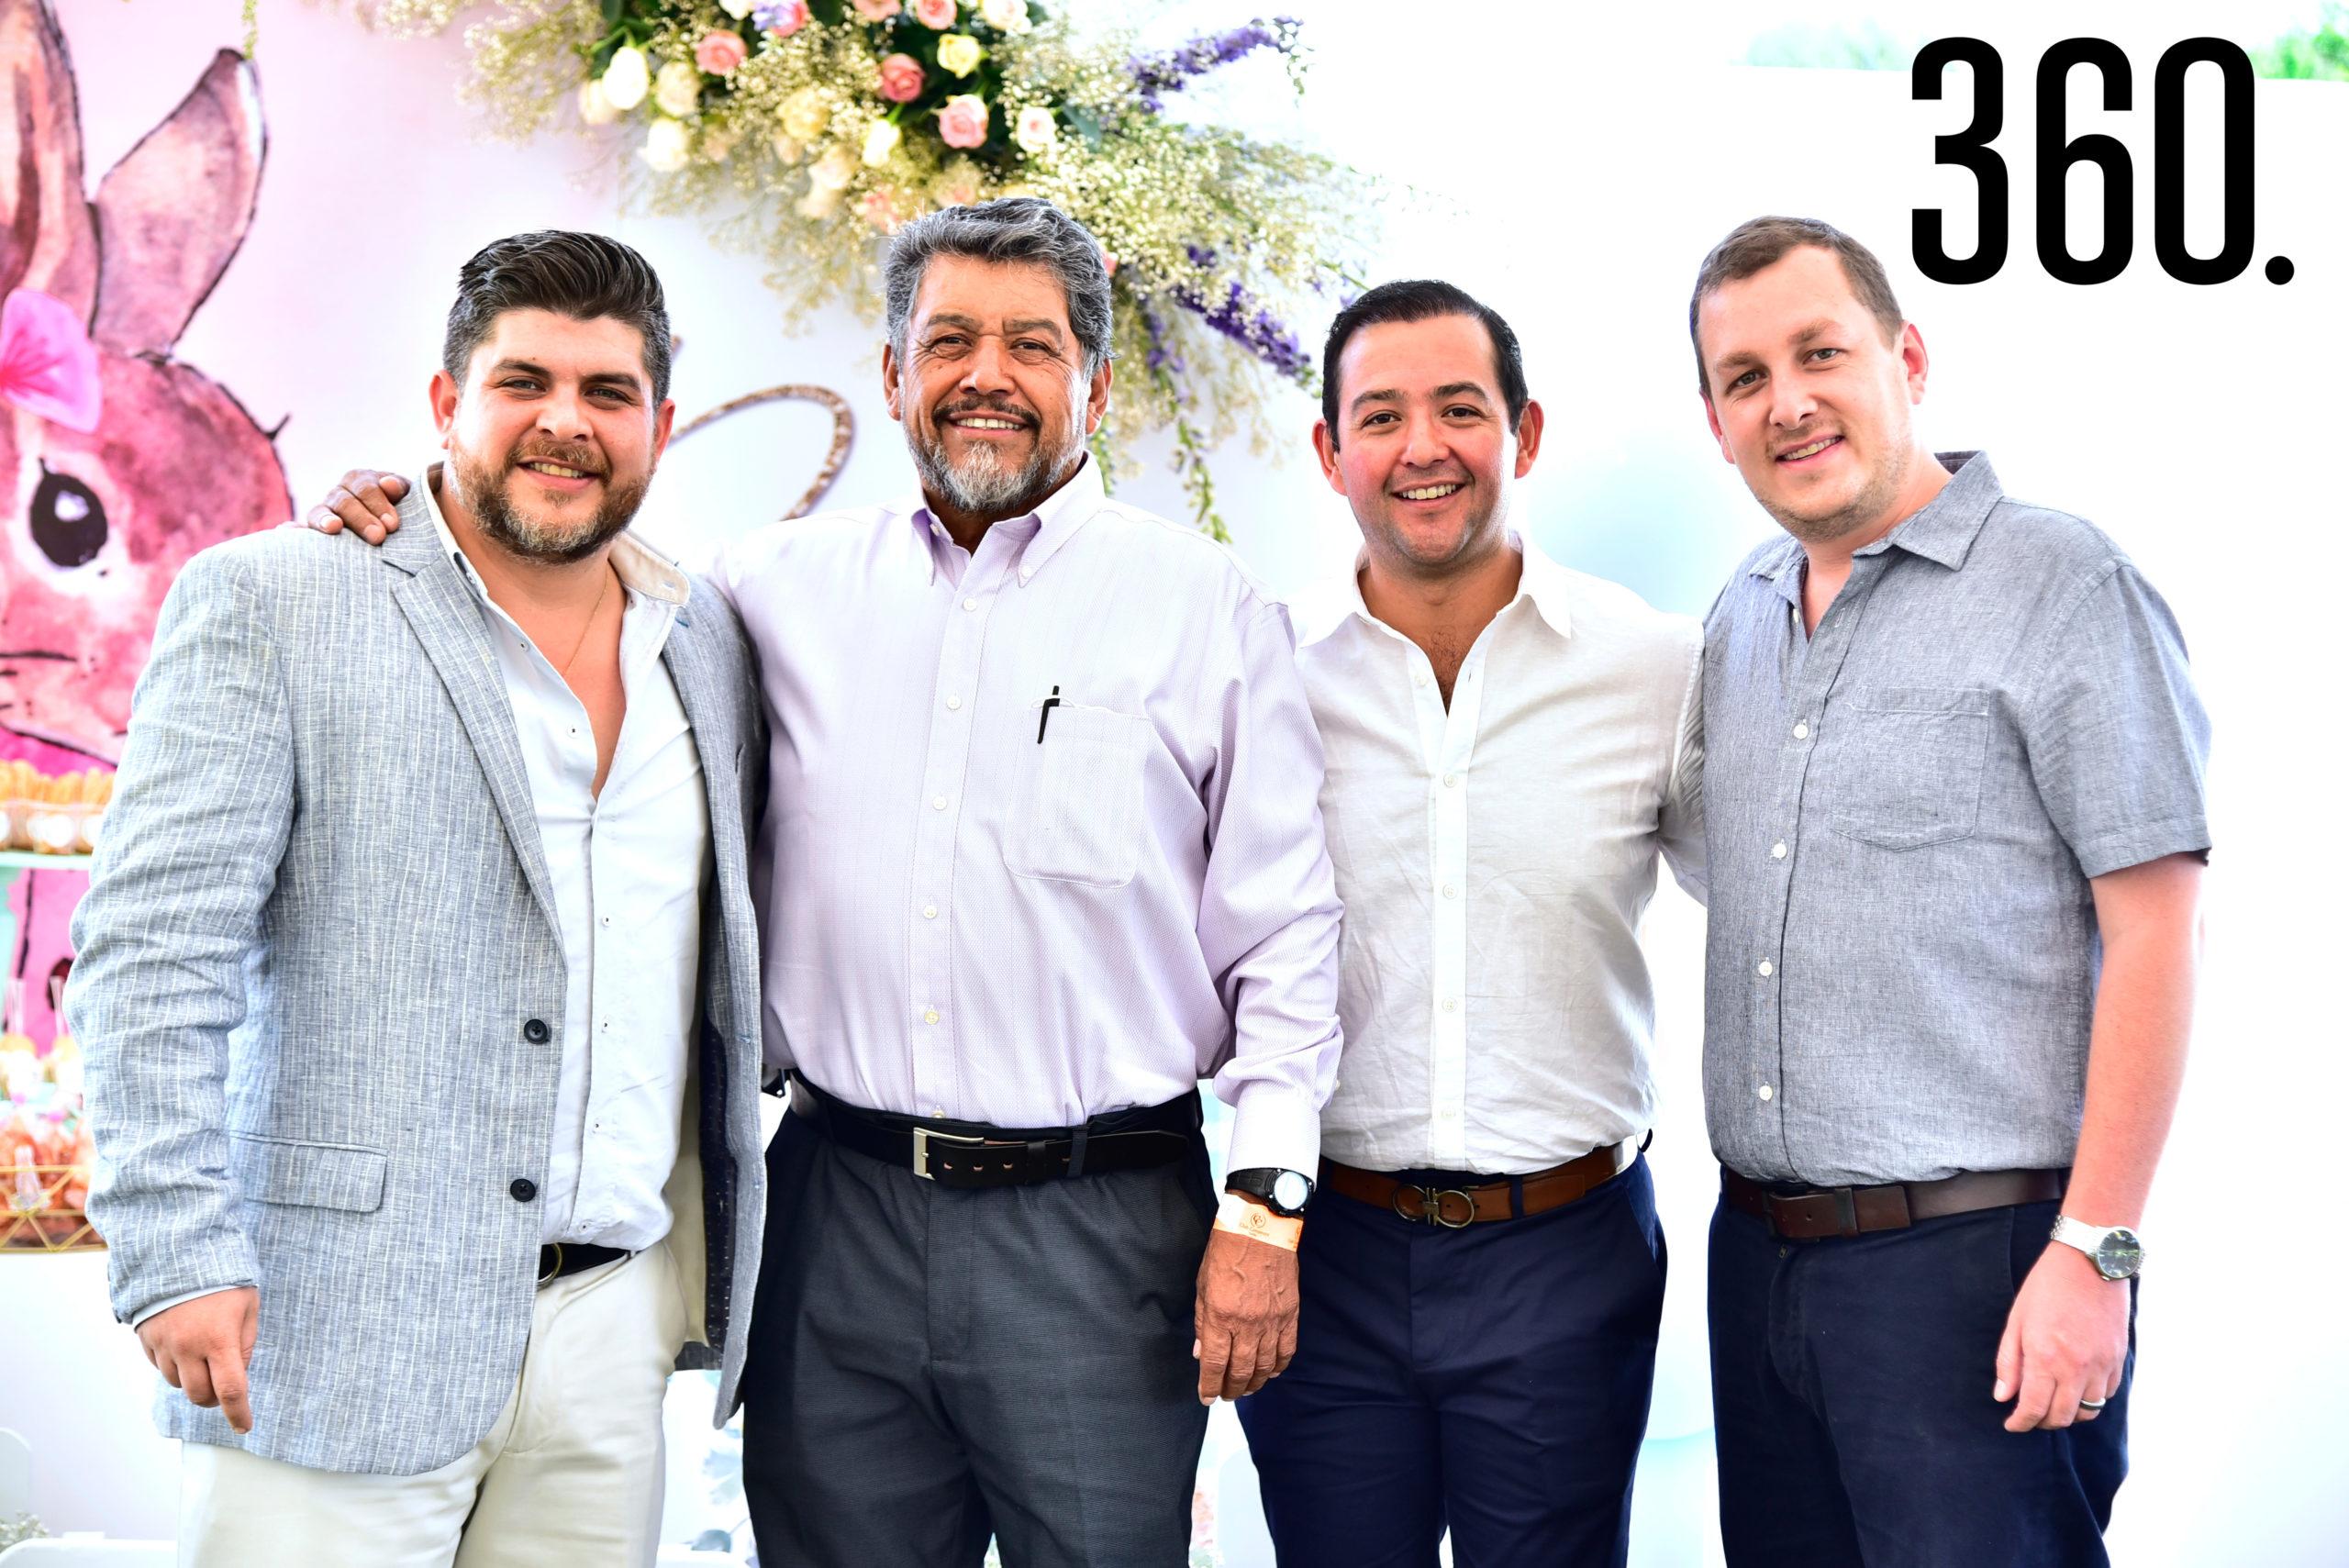 Mauro Garza, José Luis Pérez, José Luis Pérez y Fernando Carrillo.